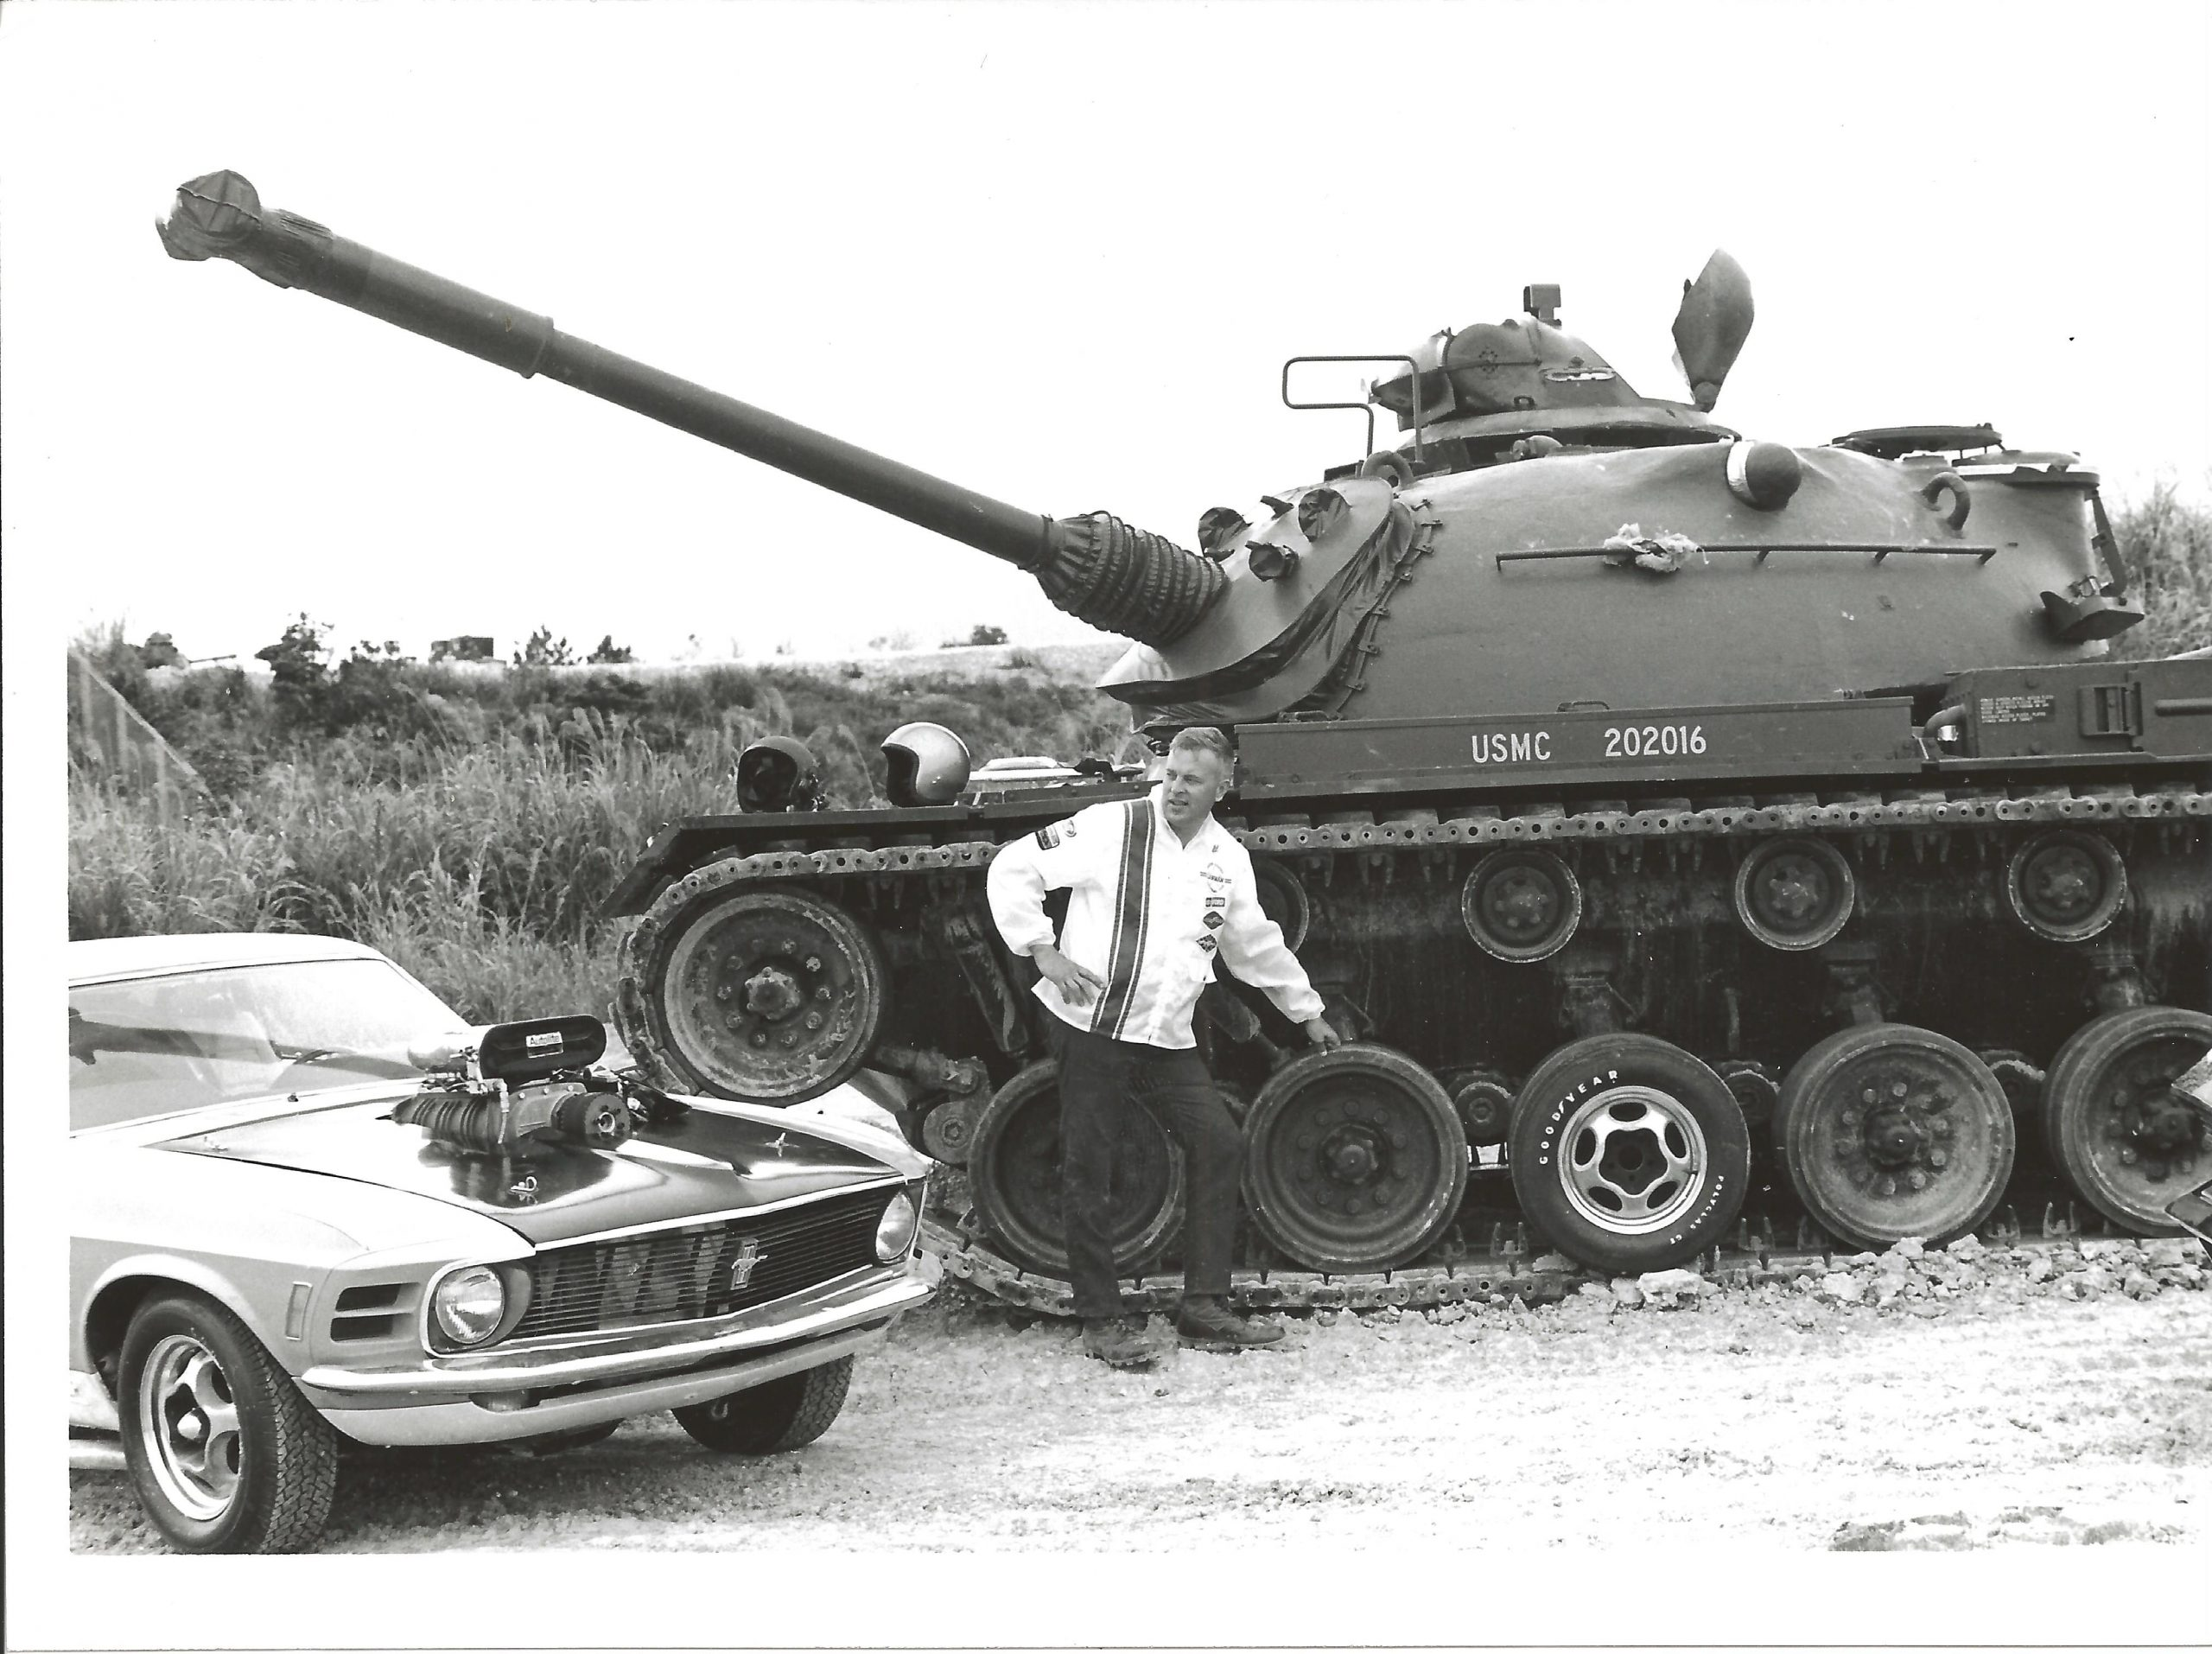 Lawman Boss 429 Ford Mustang historical car beside USMC battle tank black and white